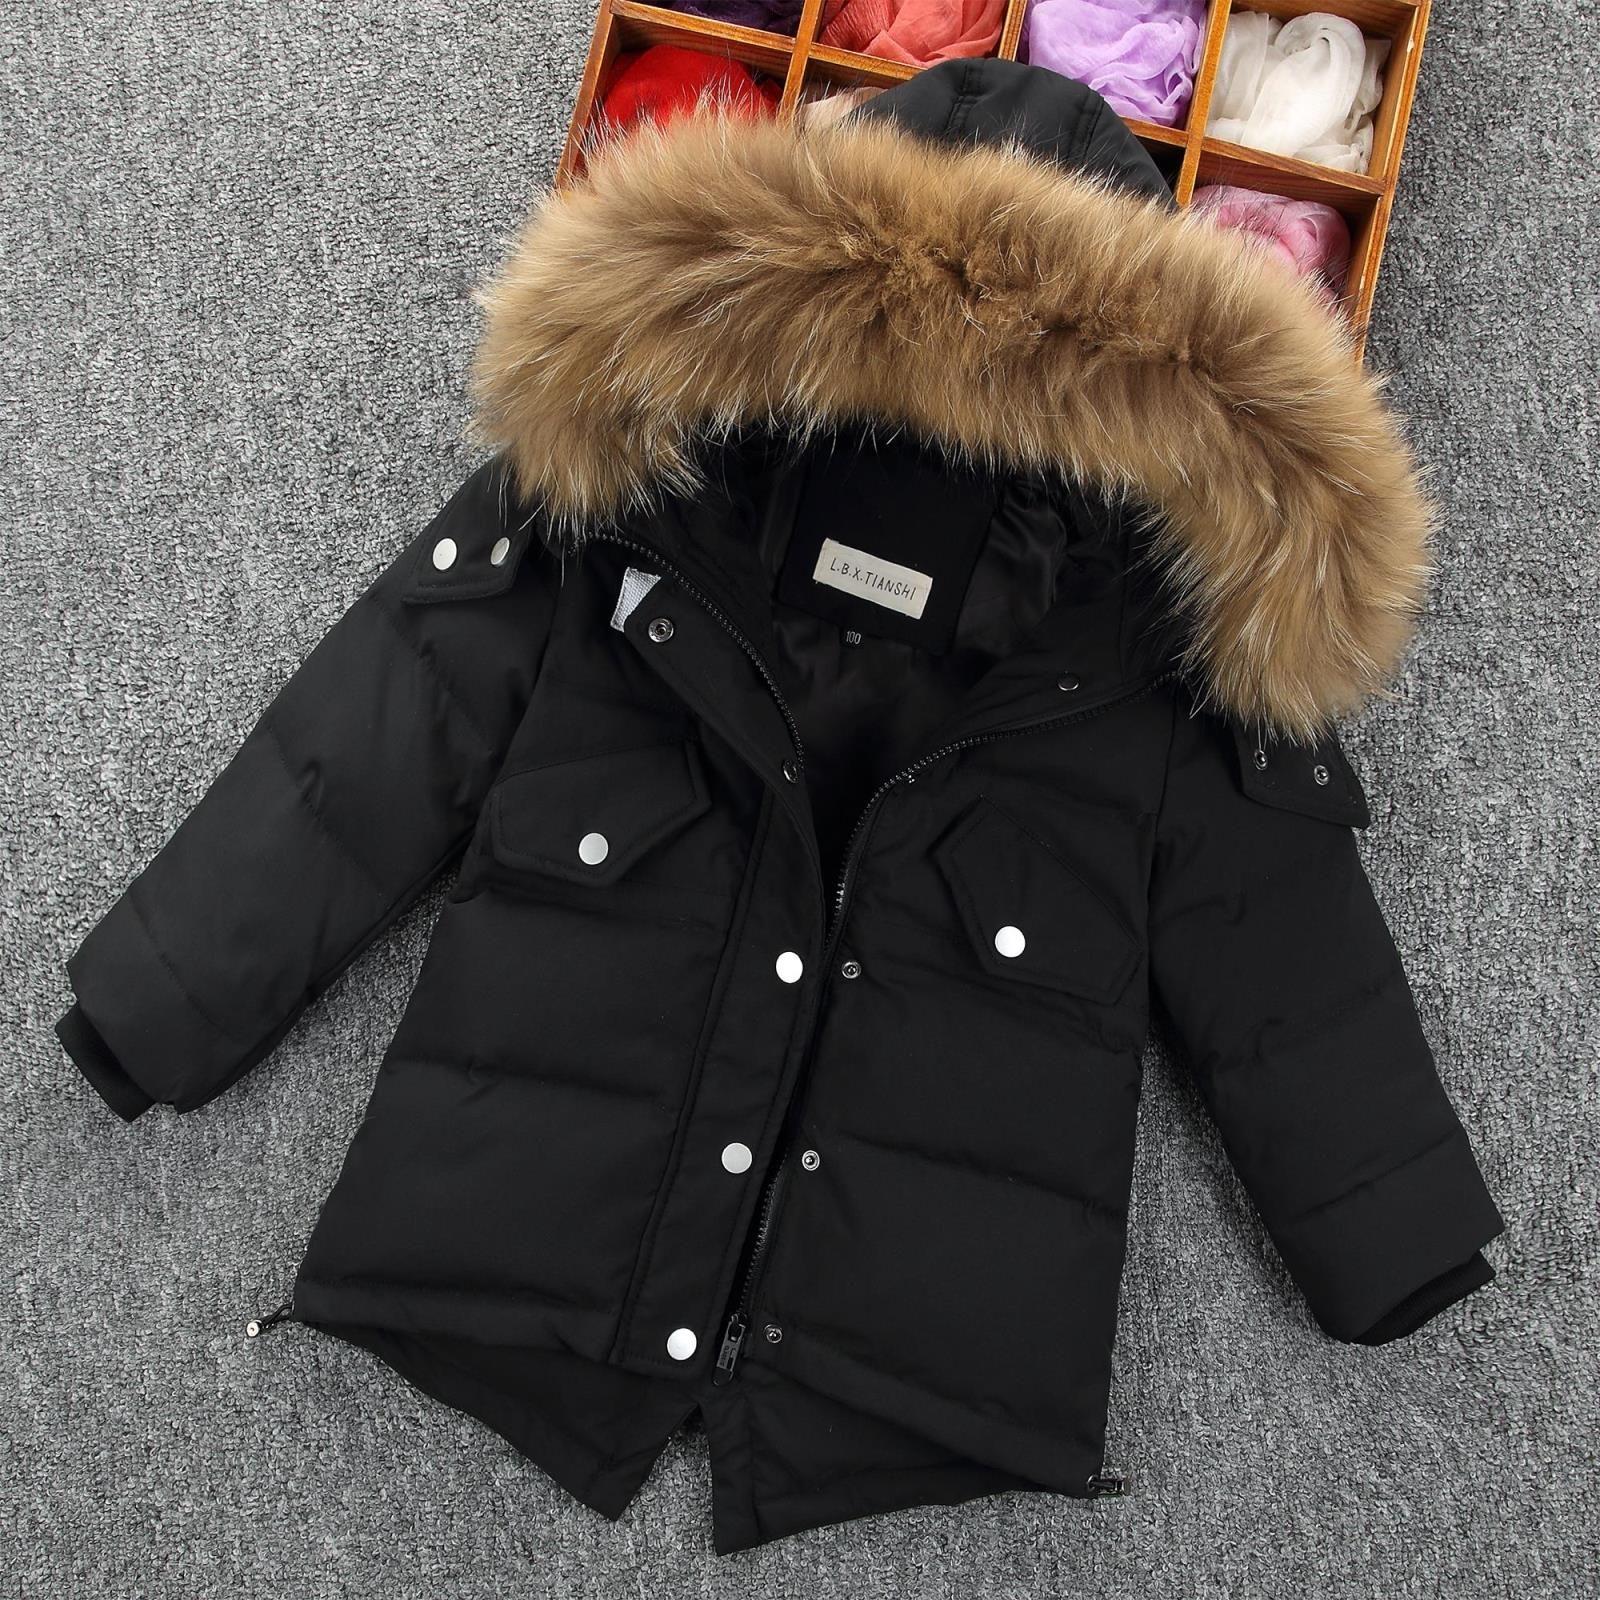 brand new 29693 8b74f Winter Daunenjacke Parka Mädchen Fell Kapuze verdicken Mäntel gefüttert  warme Kinder Kleidung Schnee tragen Kinder Oberbekleidung